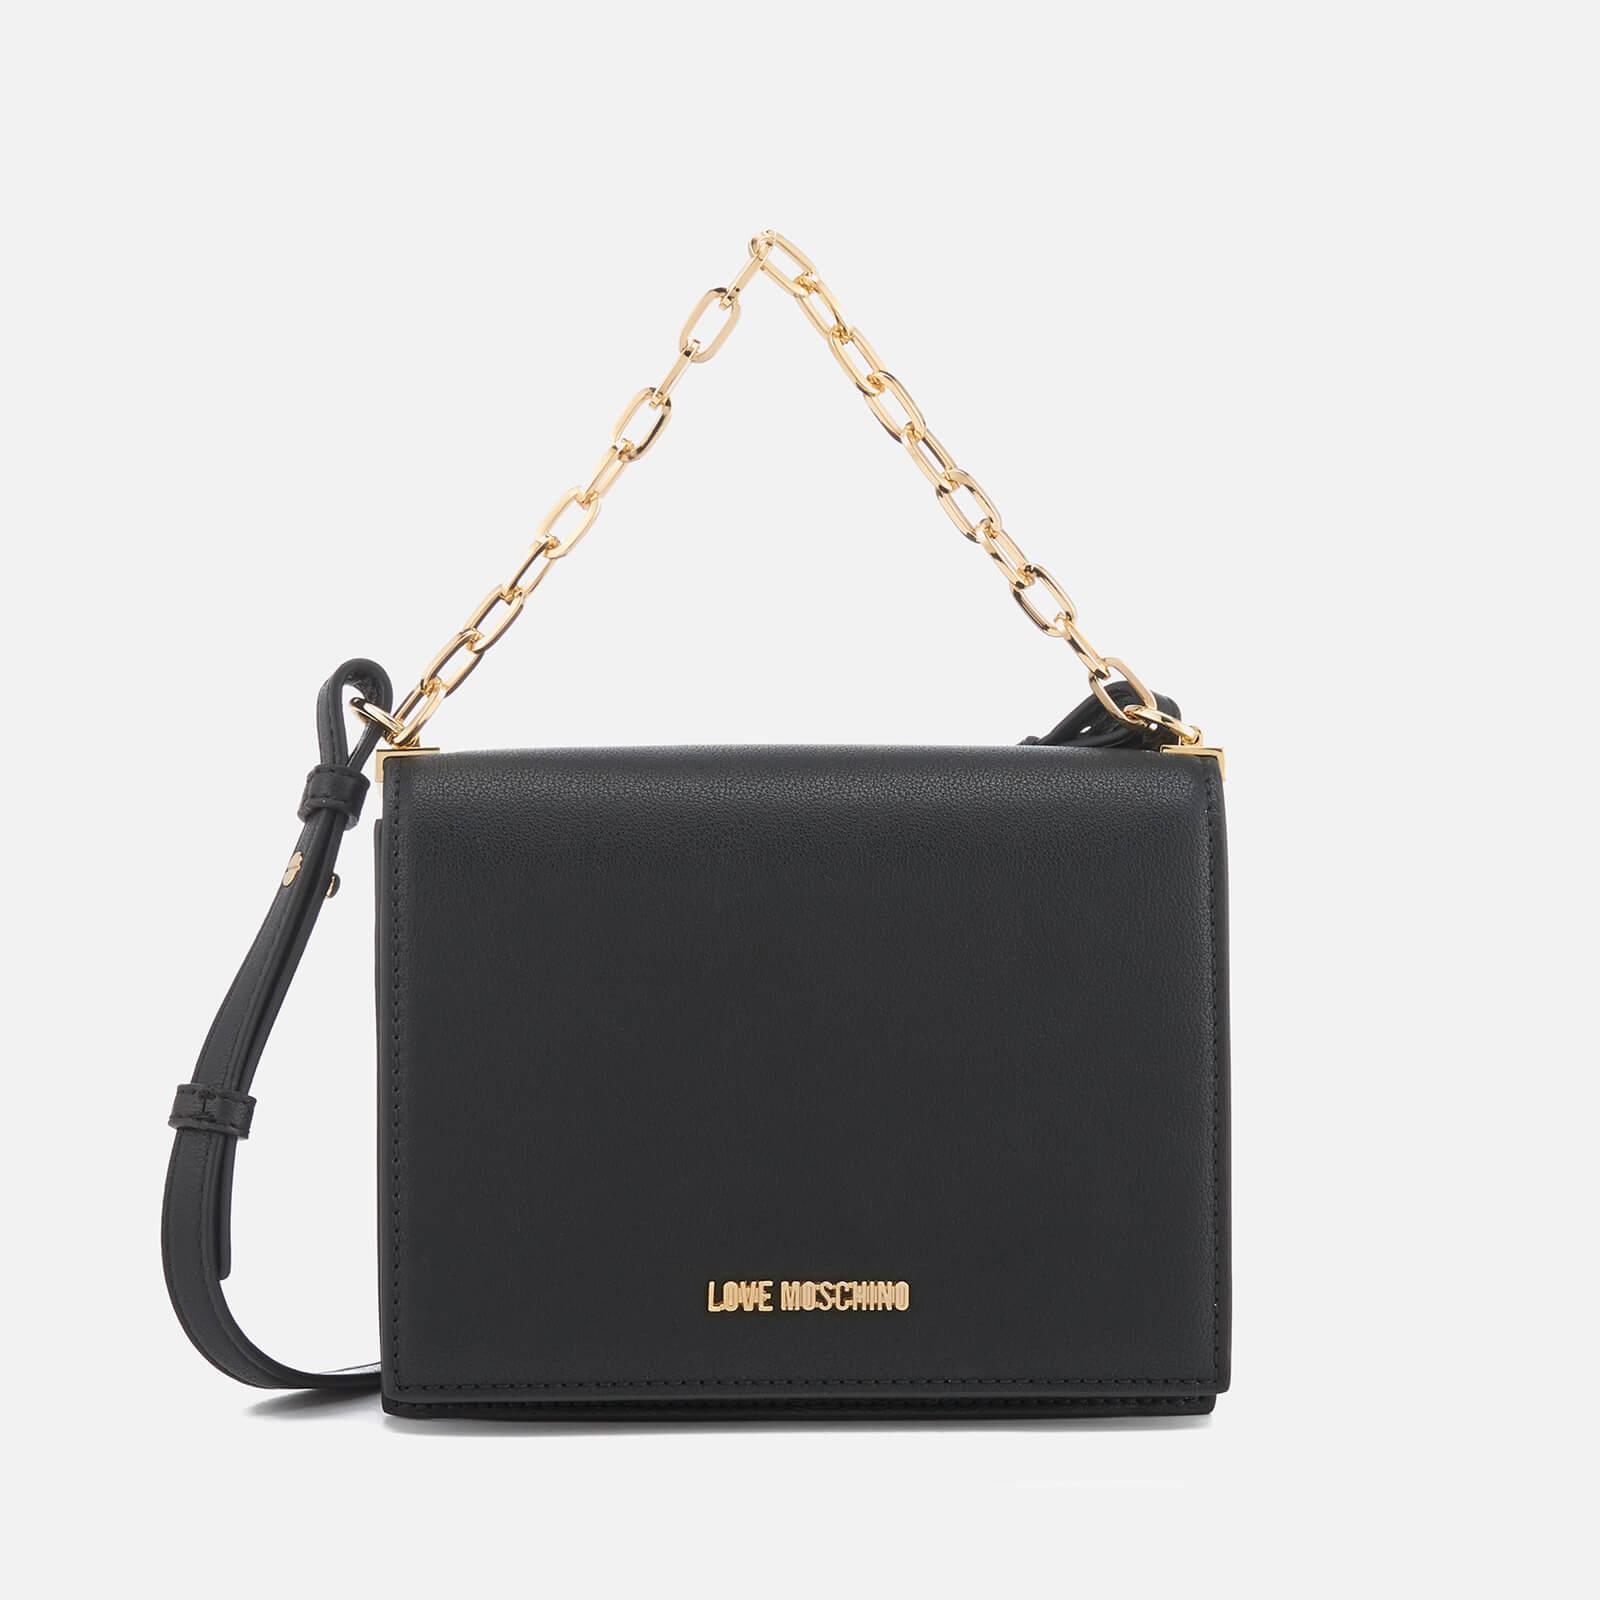 93547c77f8 Love Moschino Women's Clutch Bag - Black Womens Accessories | TheHut.com